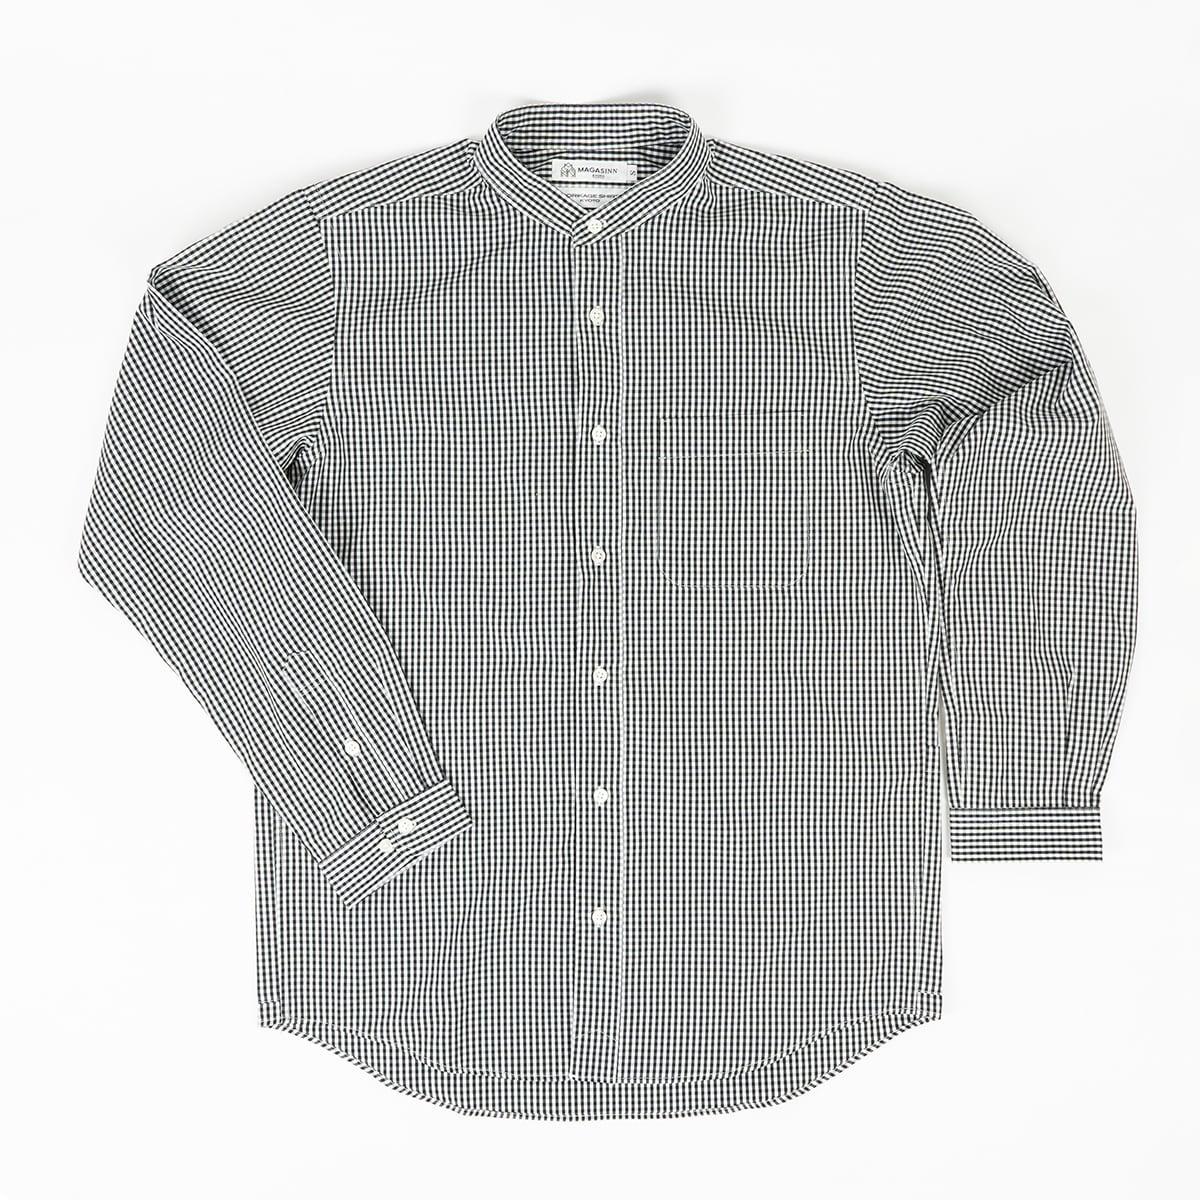 Tripper Shirt   MORIKAGE SHIRT KYOTO  × MAGASINN KYOTO